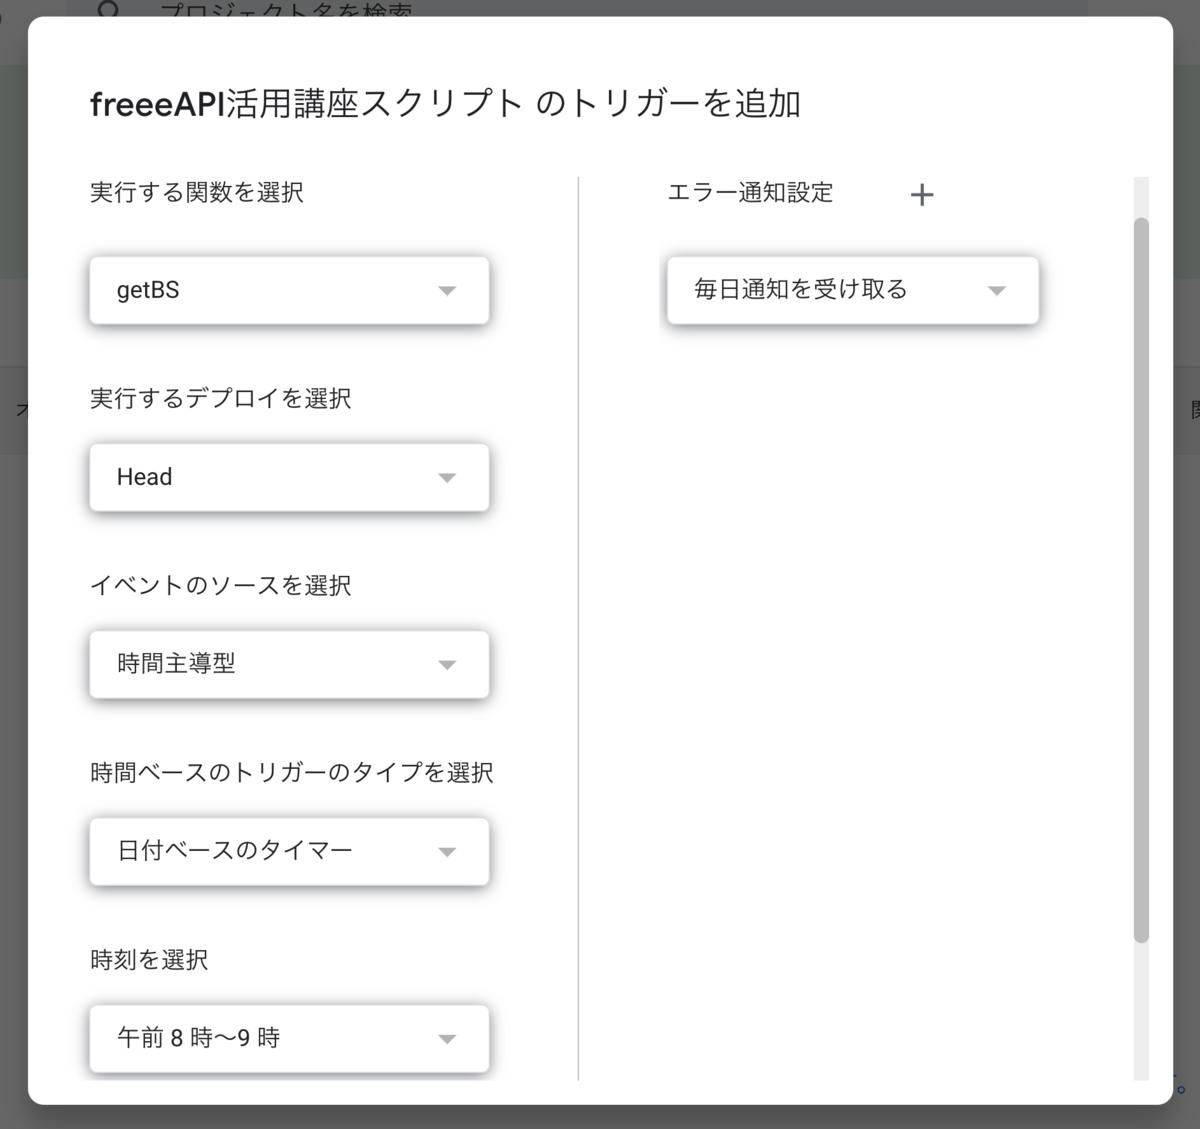 Google Apps Scriptのトリガー機能を設定する画面のスクリーンショット